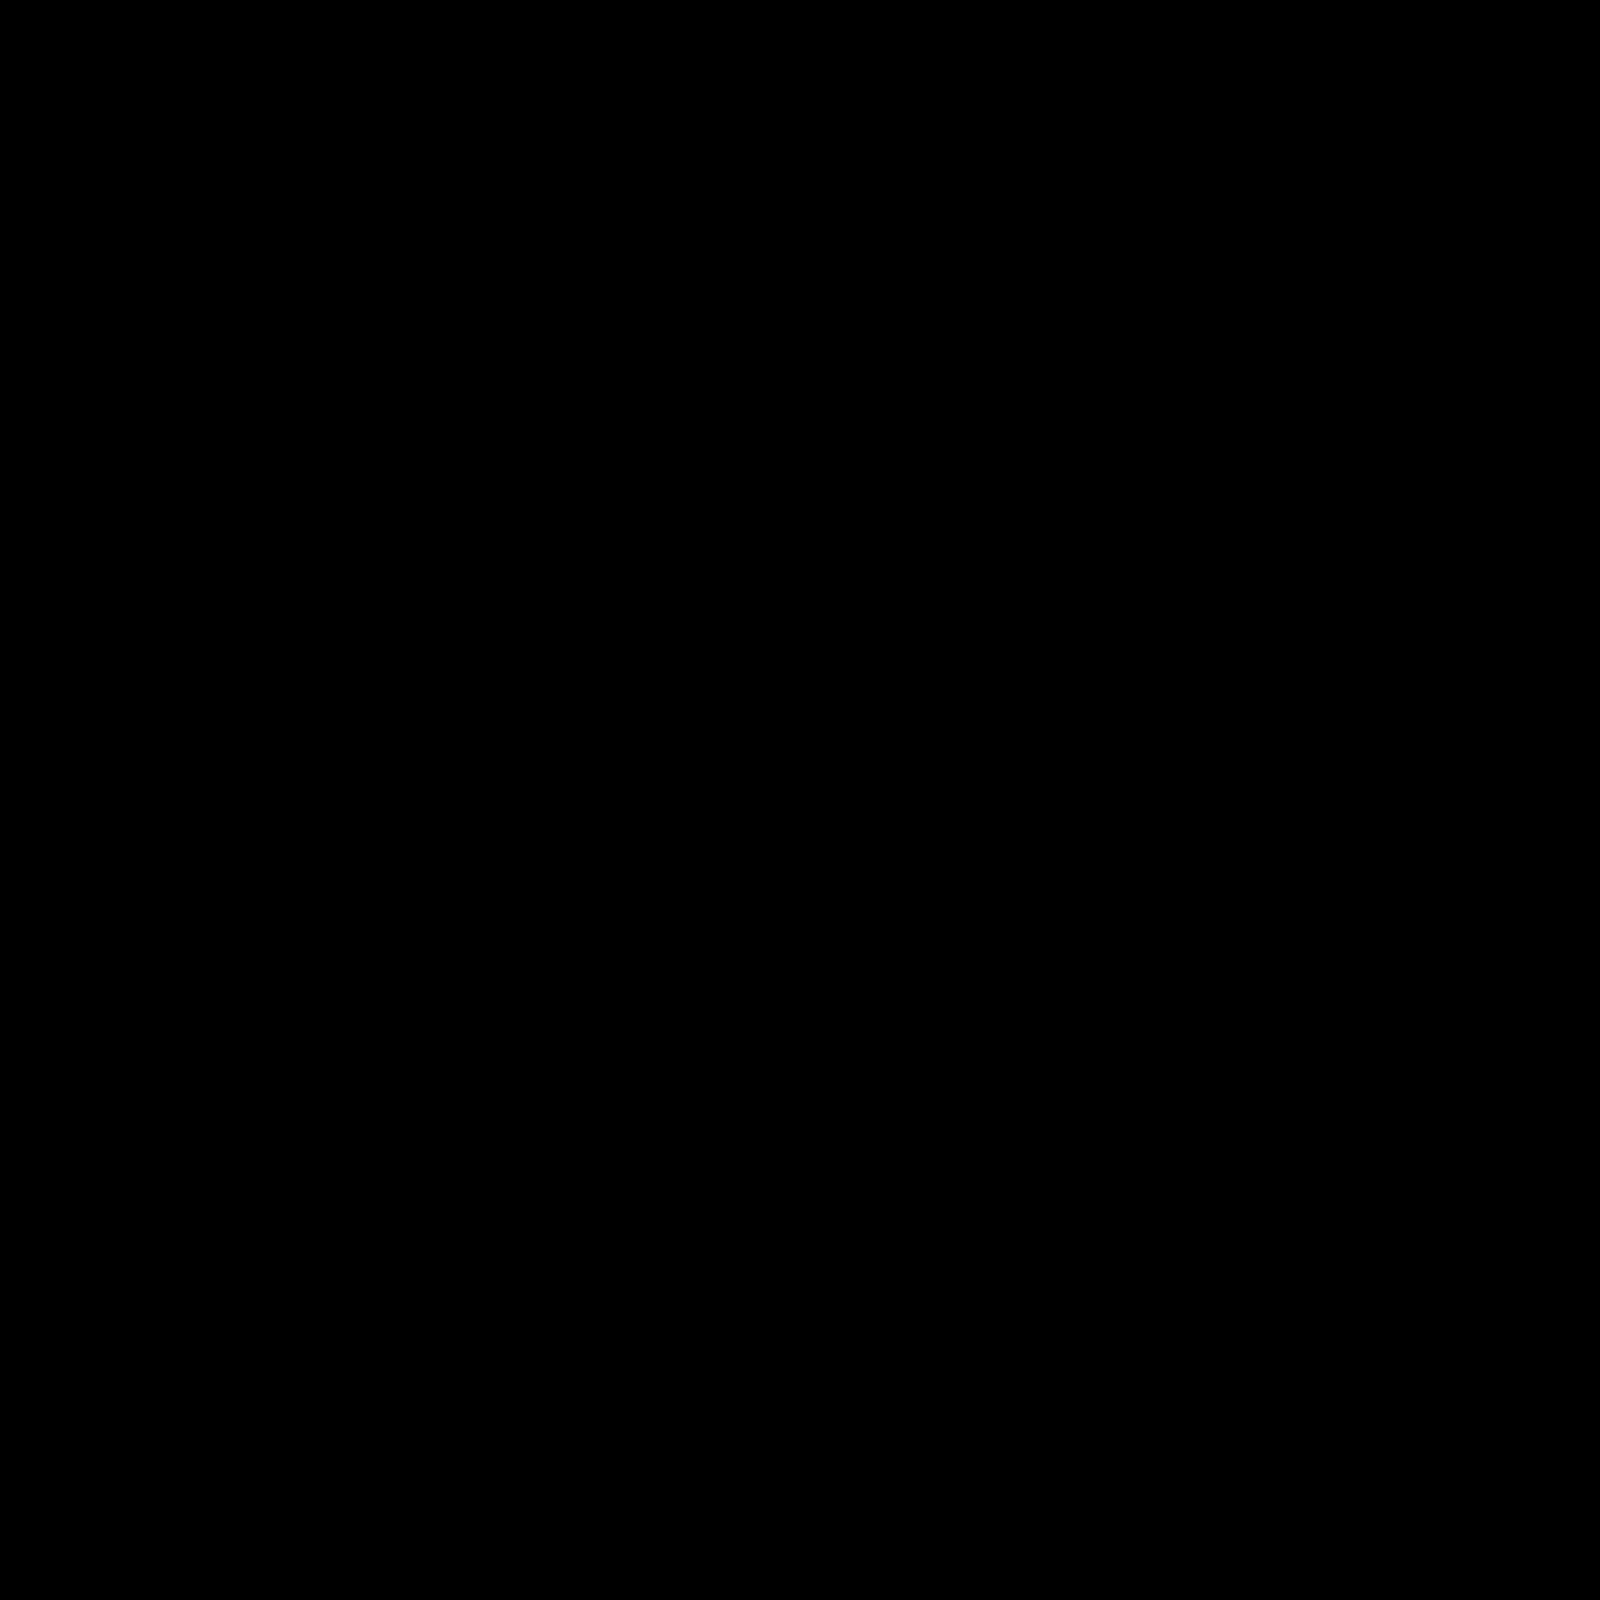 Xbox Filled icon